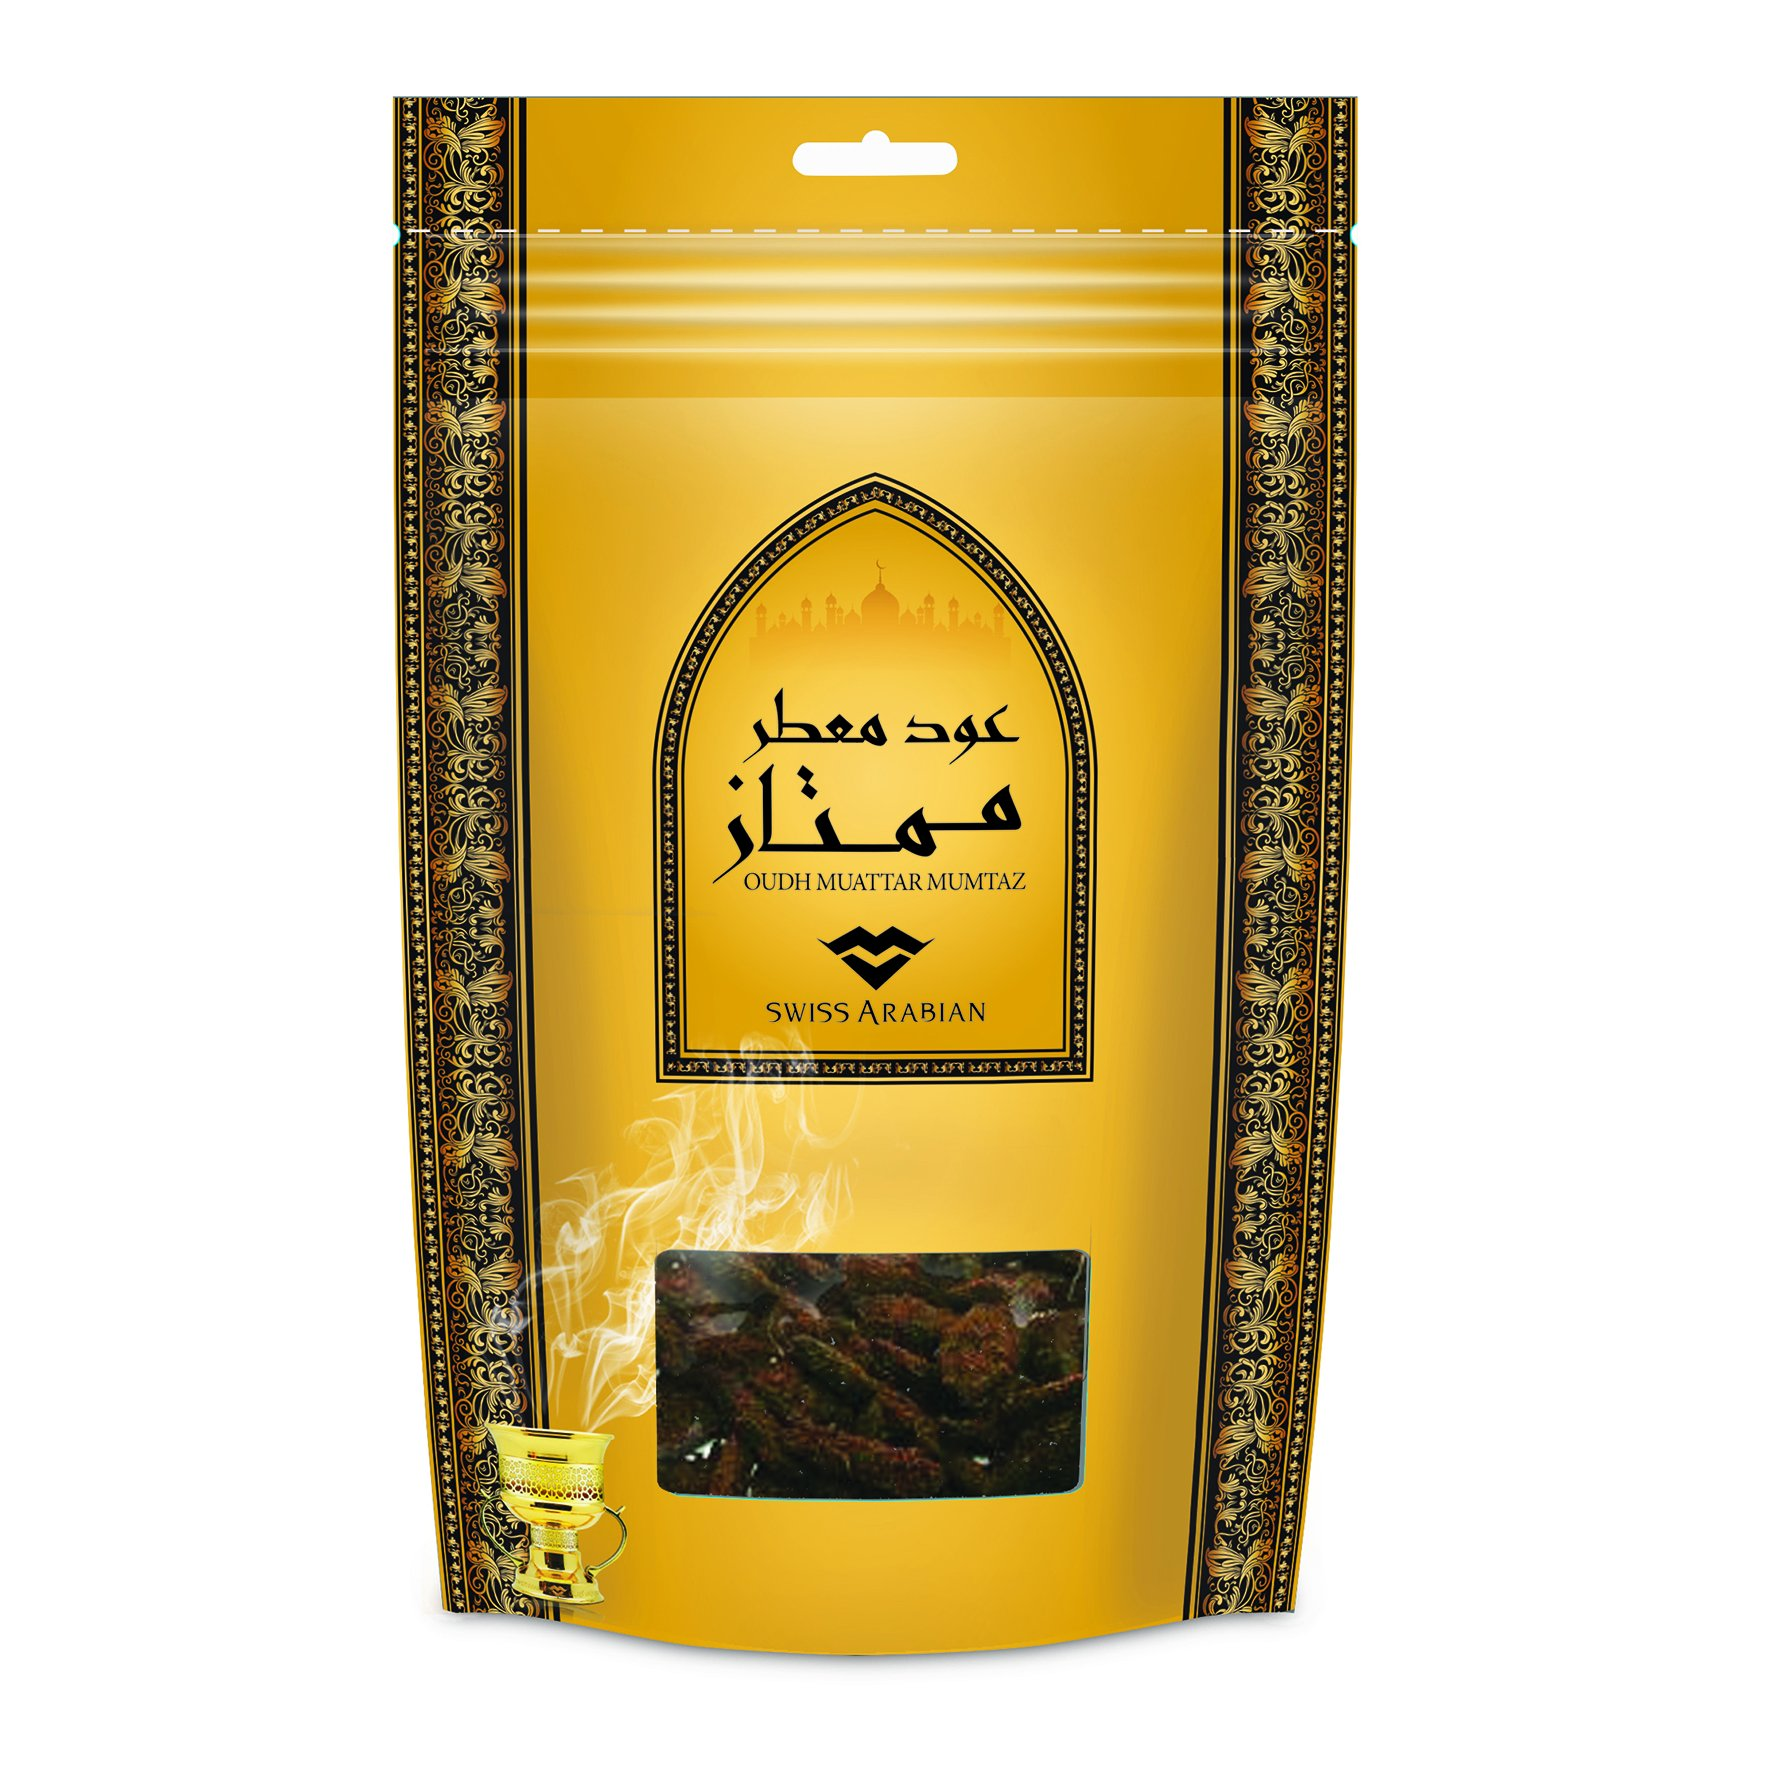 SWISSARABIAN Muattar Mumtaz (250g/.55 lb) Oudh Bakhoor Incense by Oud Perfume Artisan Swiss Arabian